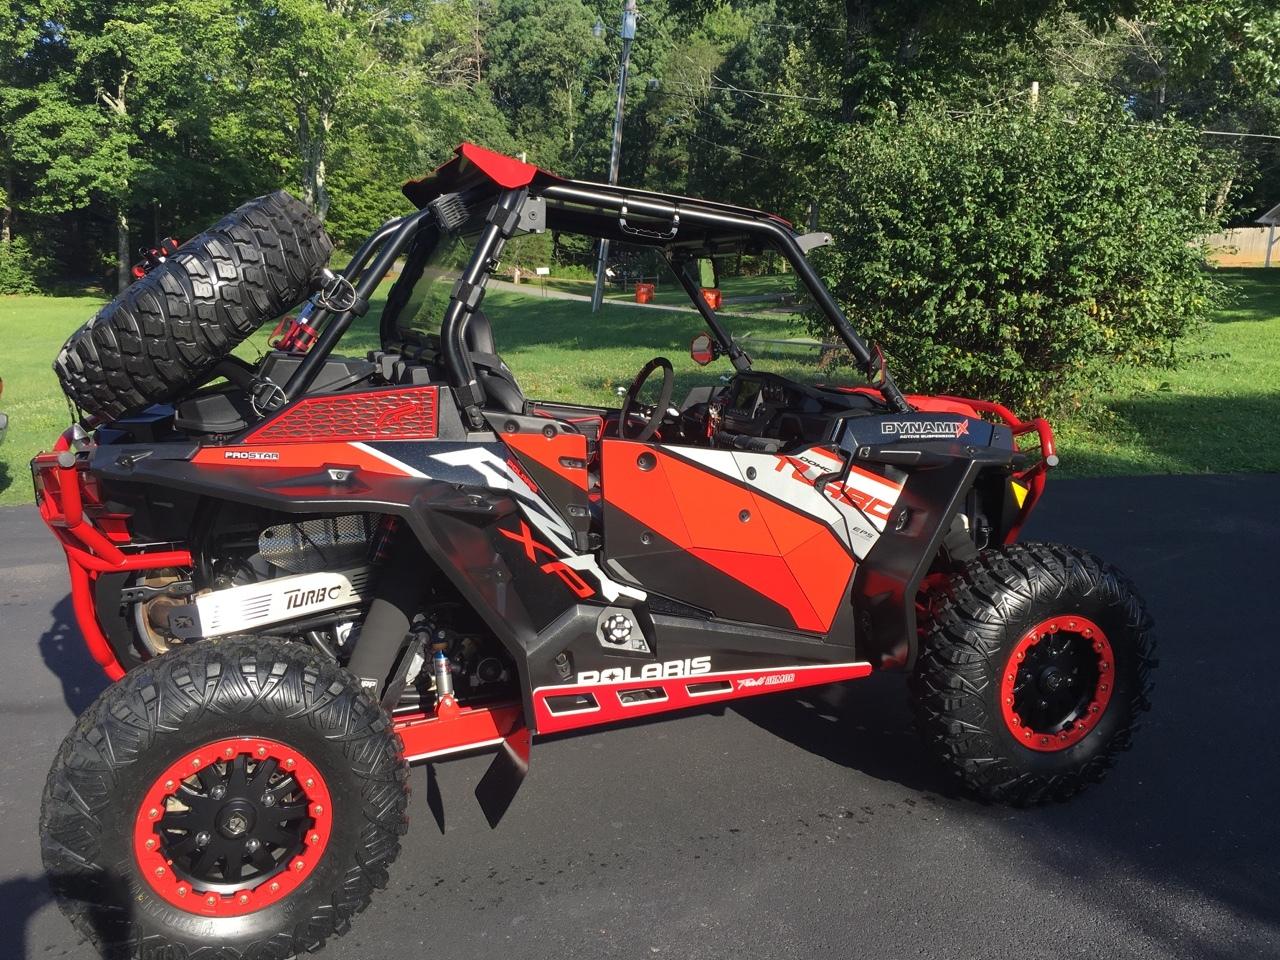 528553s For Sale: 61,267 528553s - ATV Trader